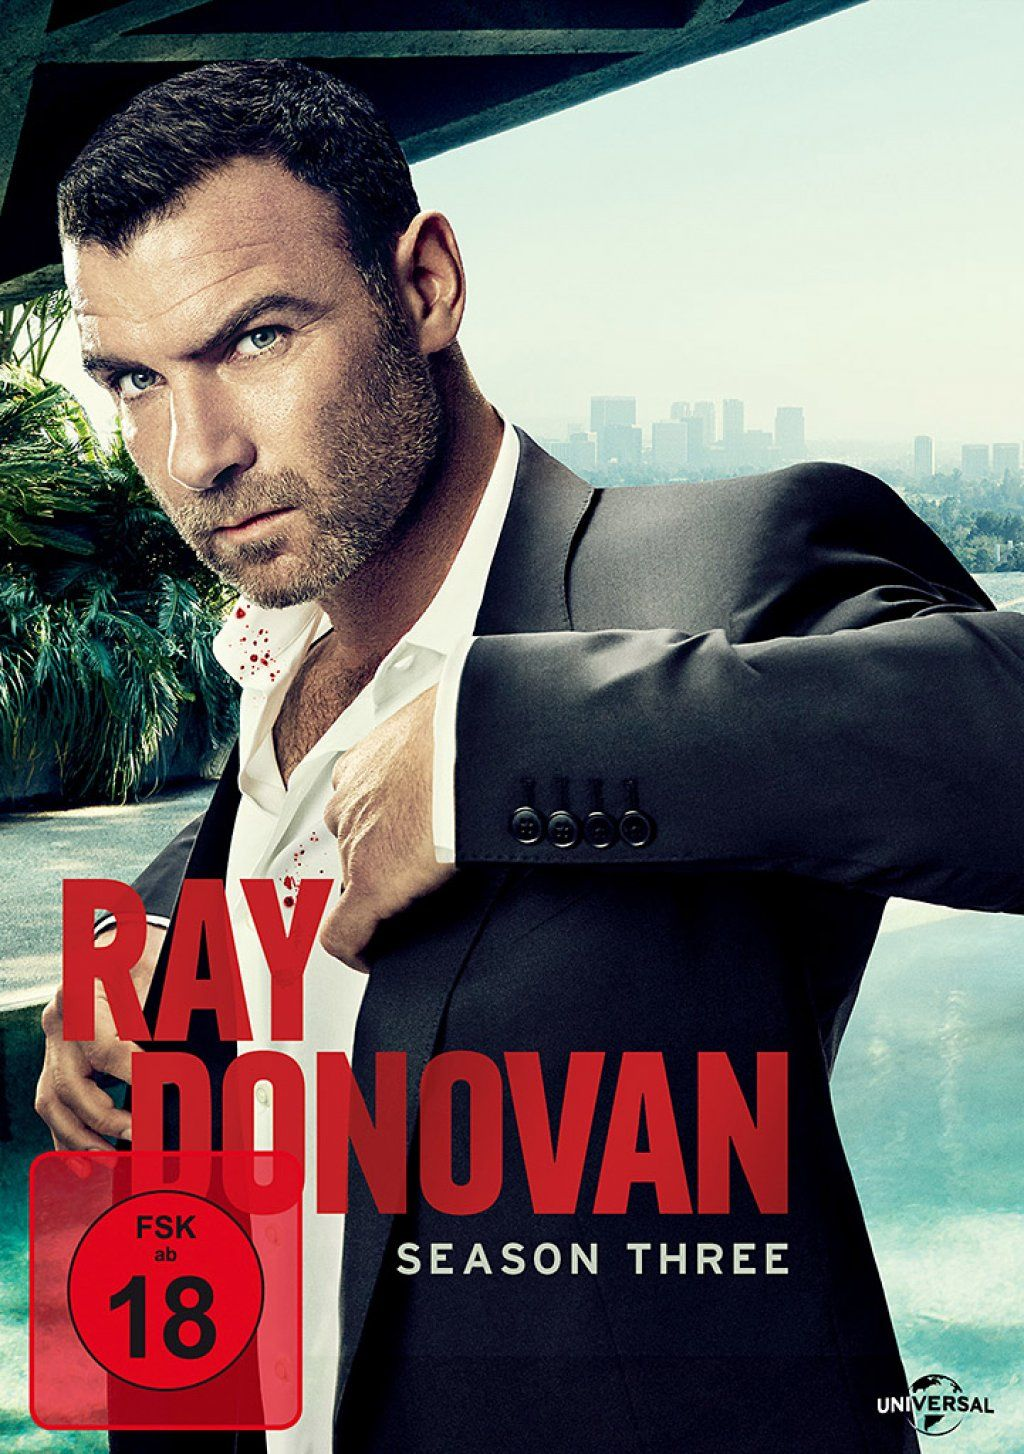 Ray Donovan - Season 3 (4 Discs)